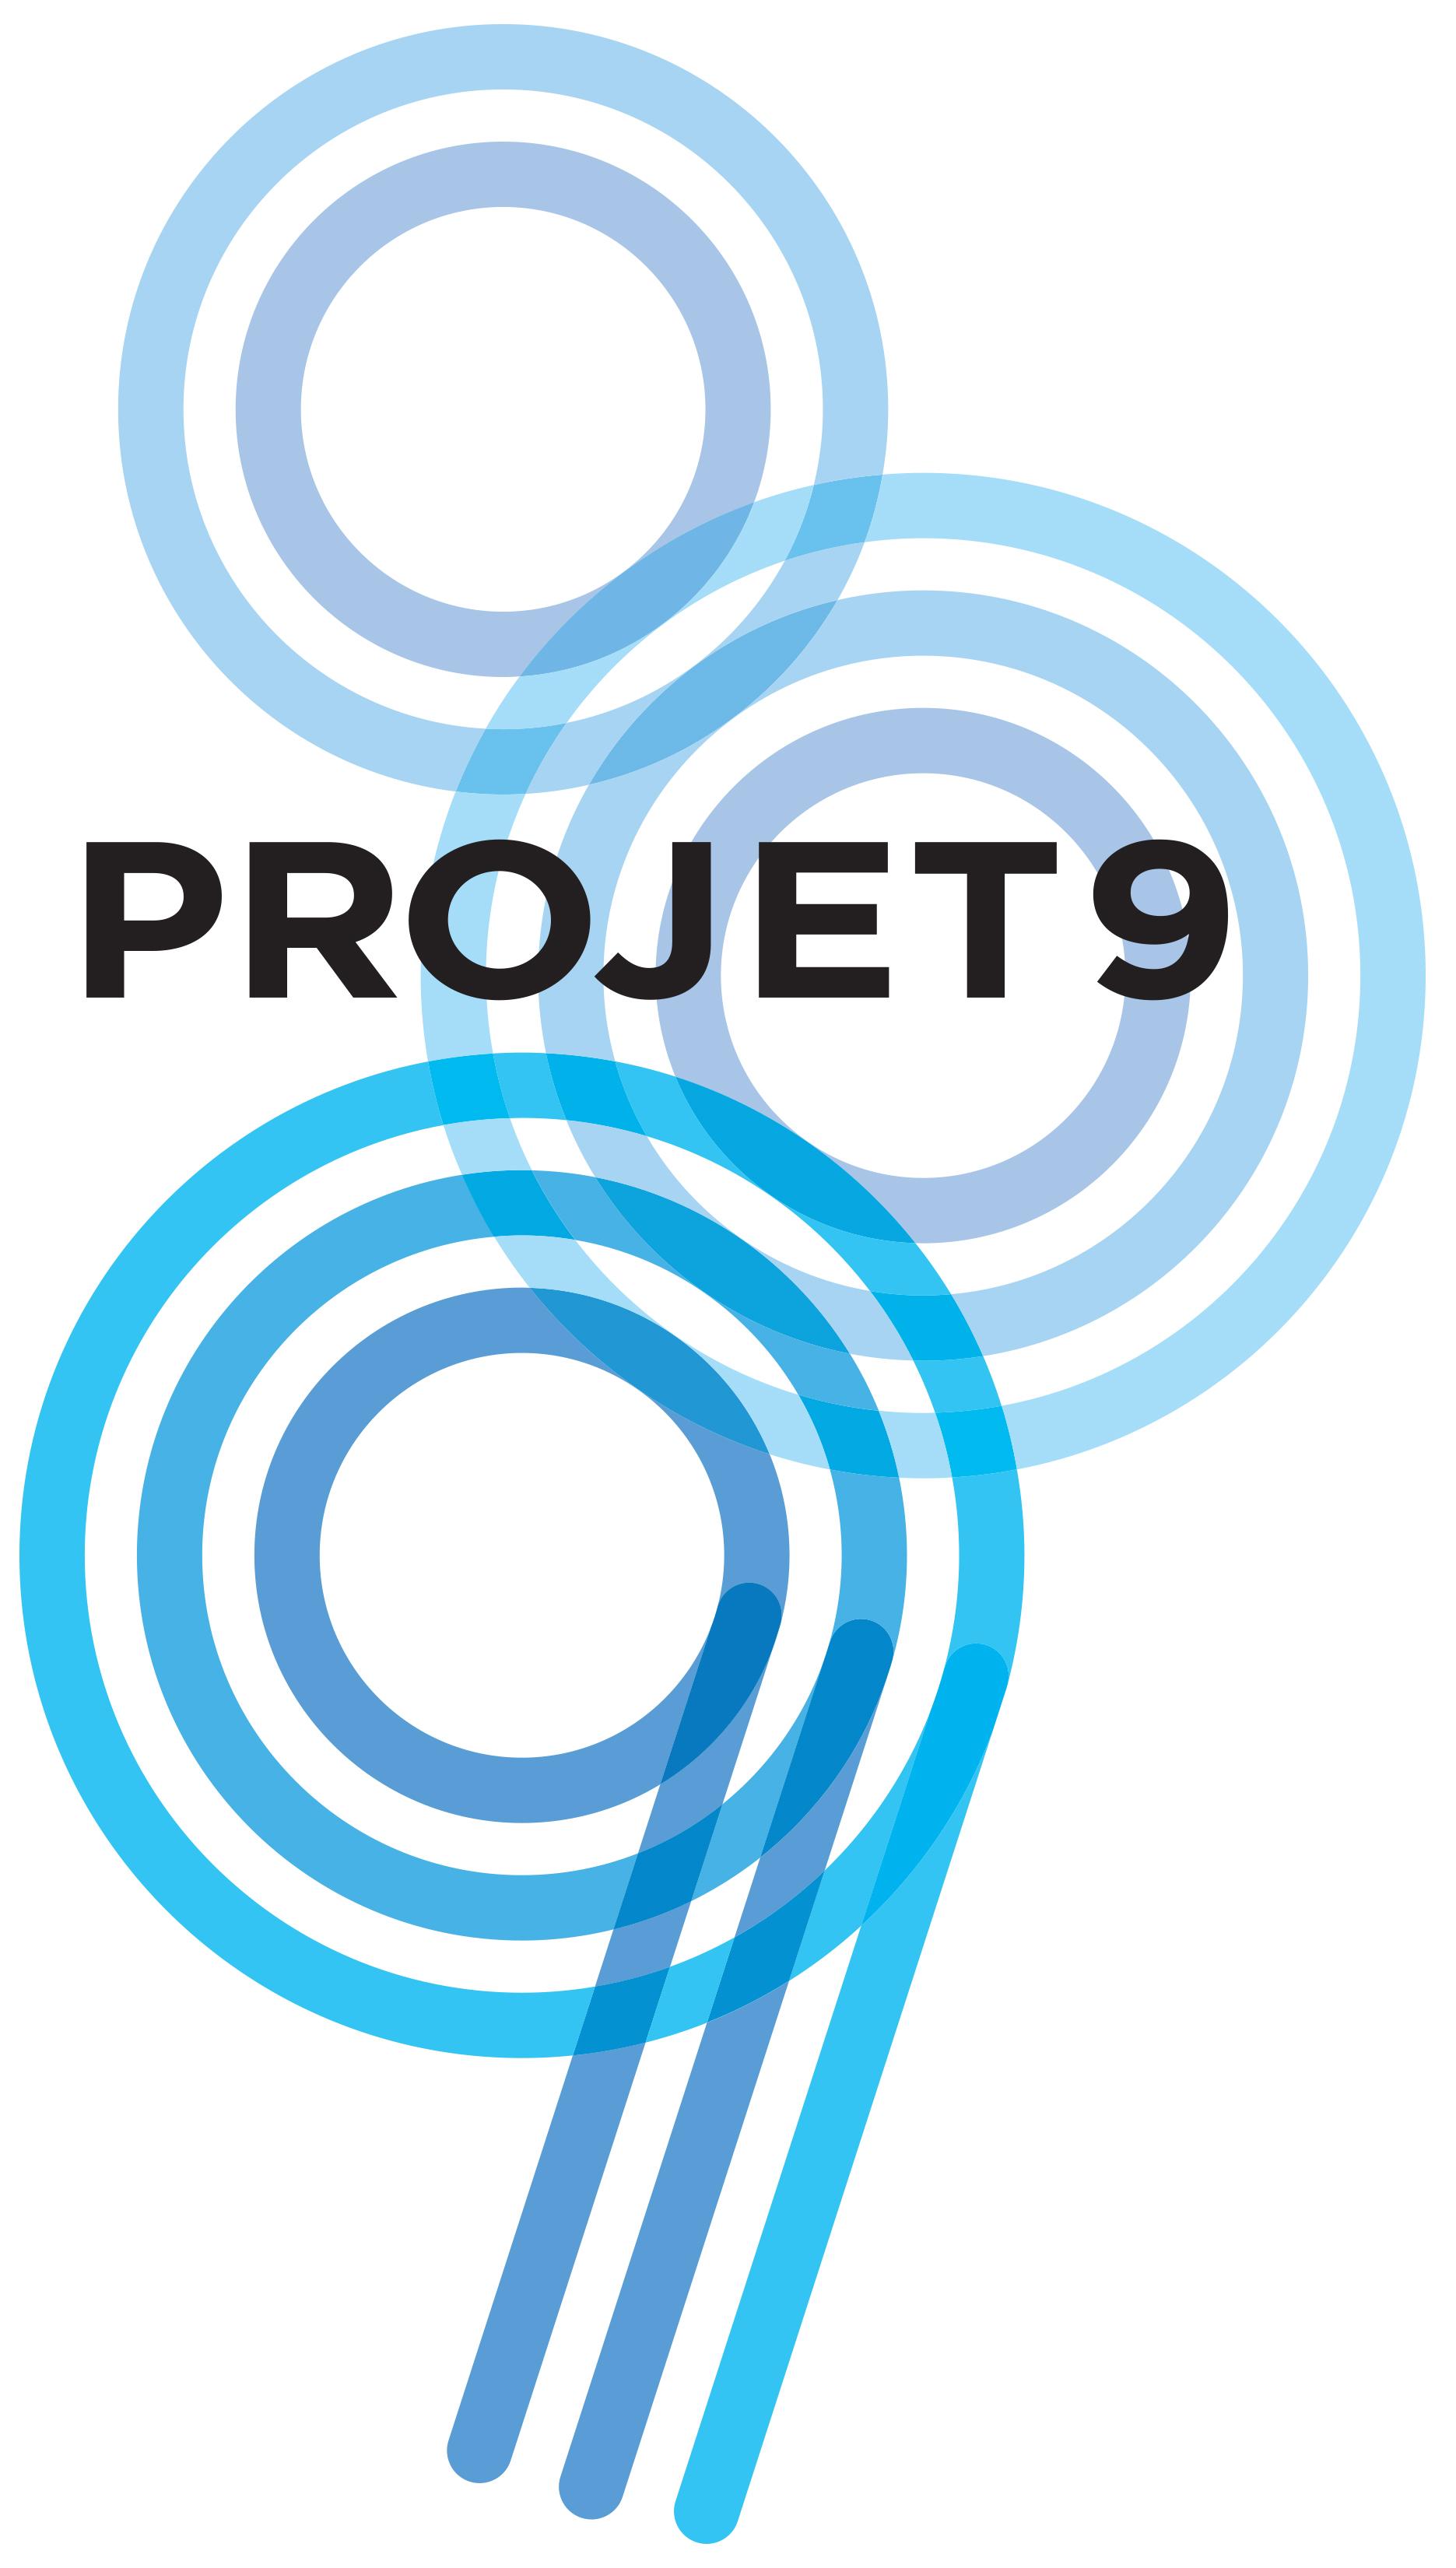 Projet 9 logo HPP